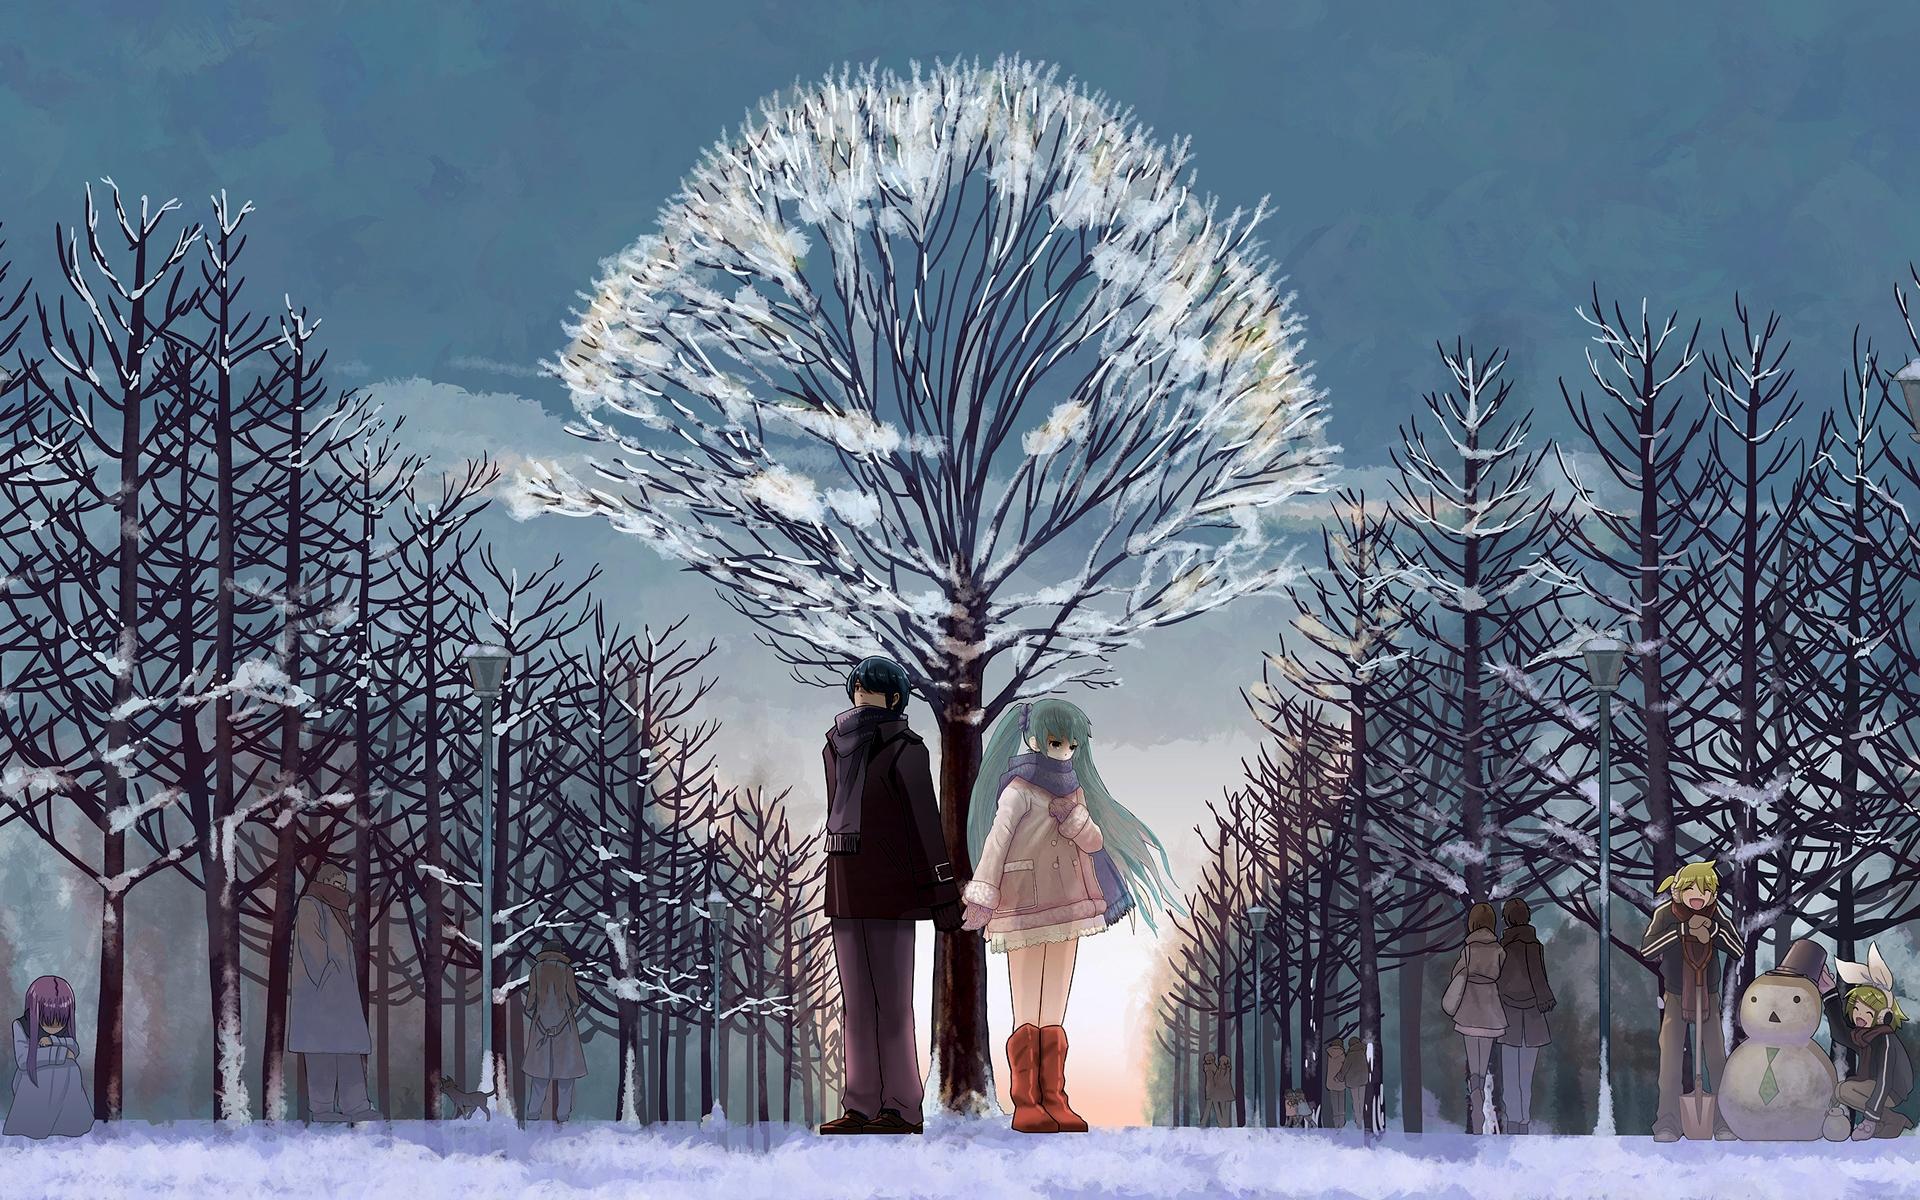 Wallpaper : Anime, Love, Sky, Snow, Winter, Branch, Ice